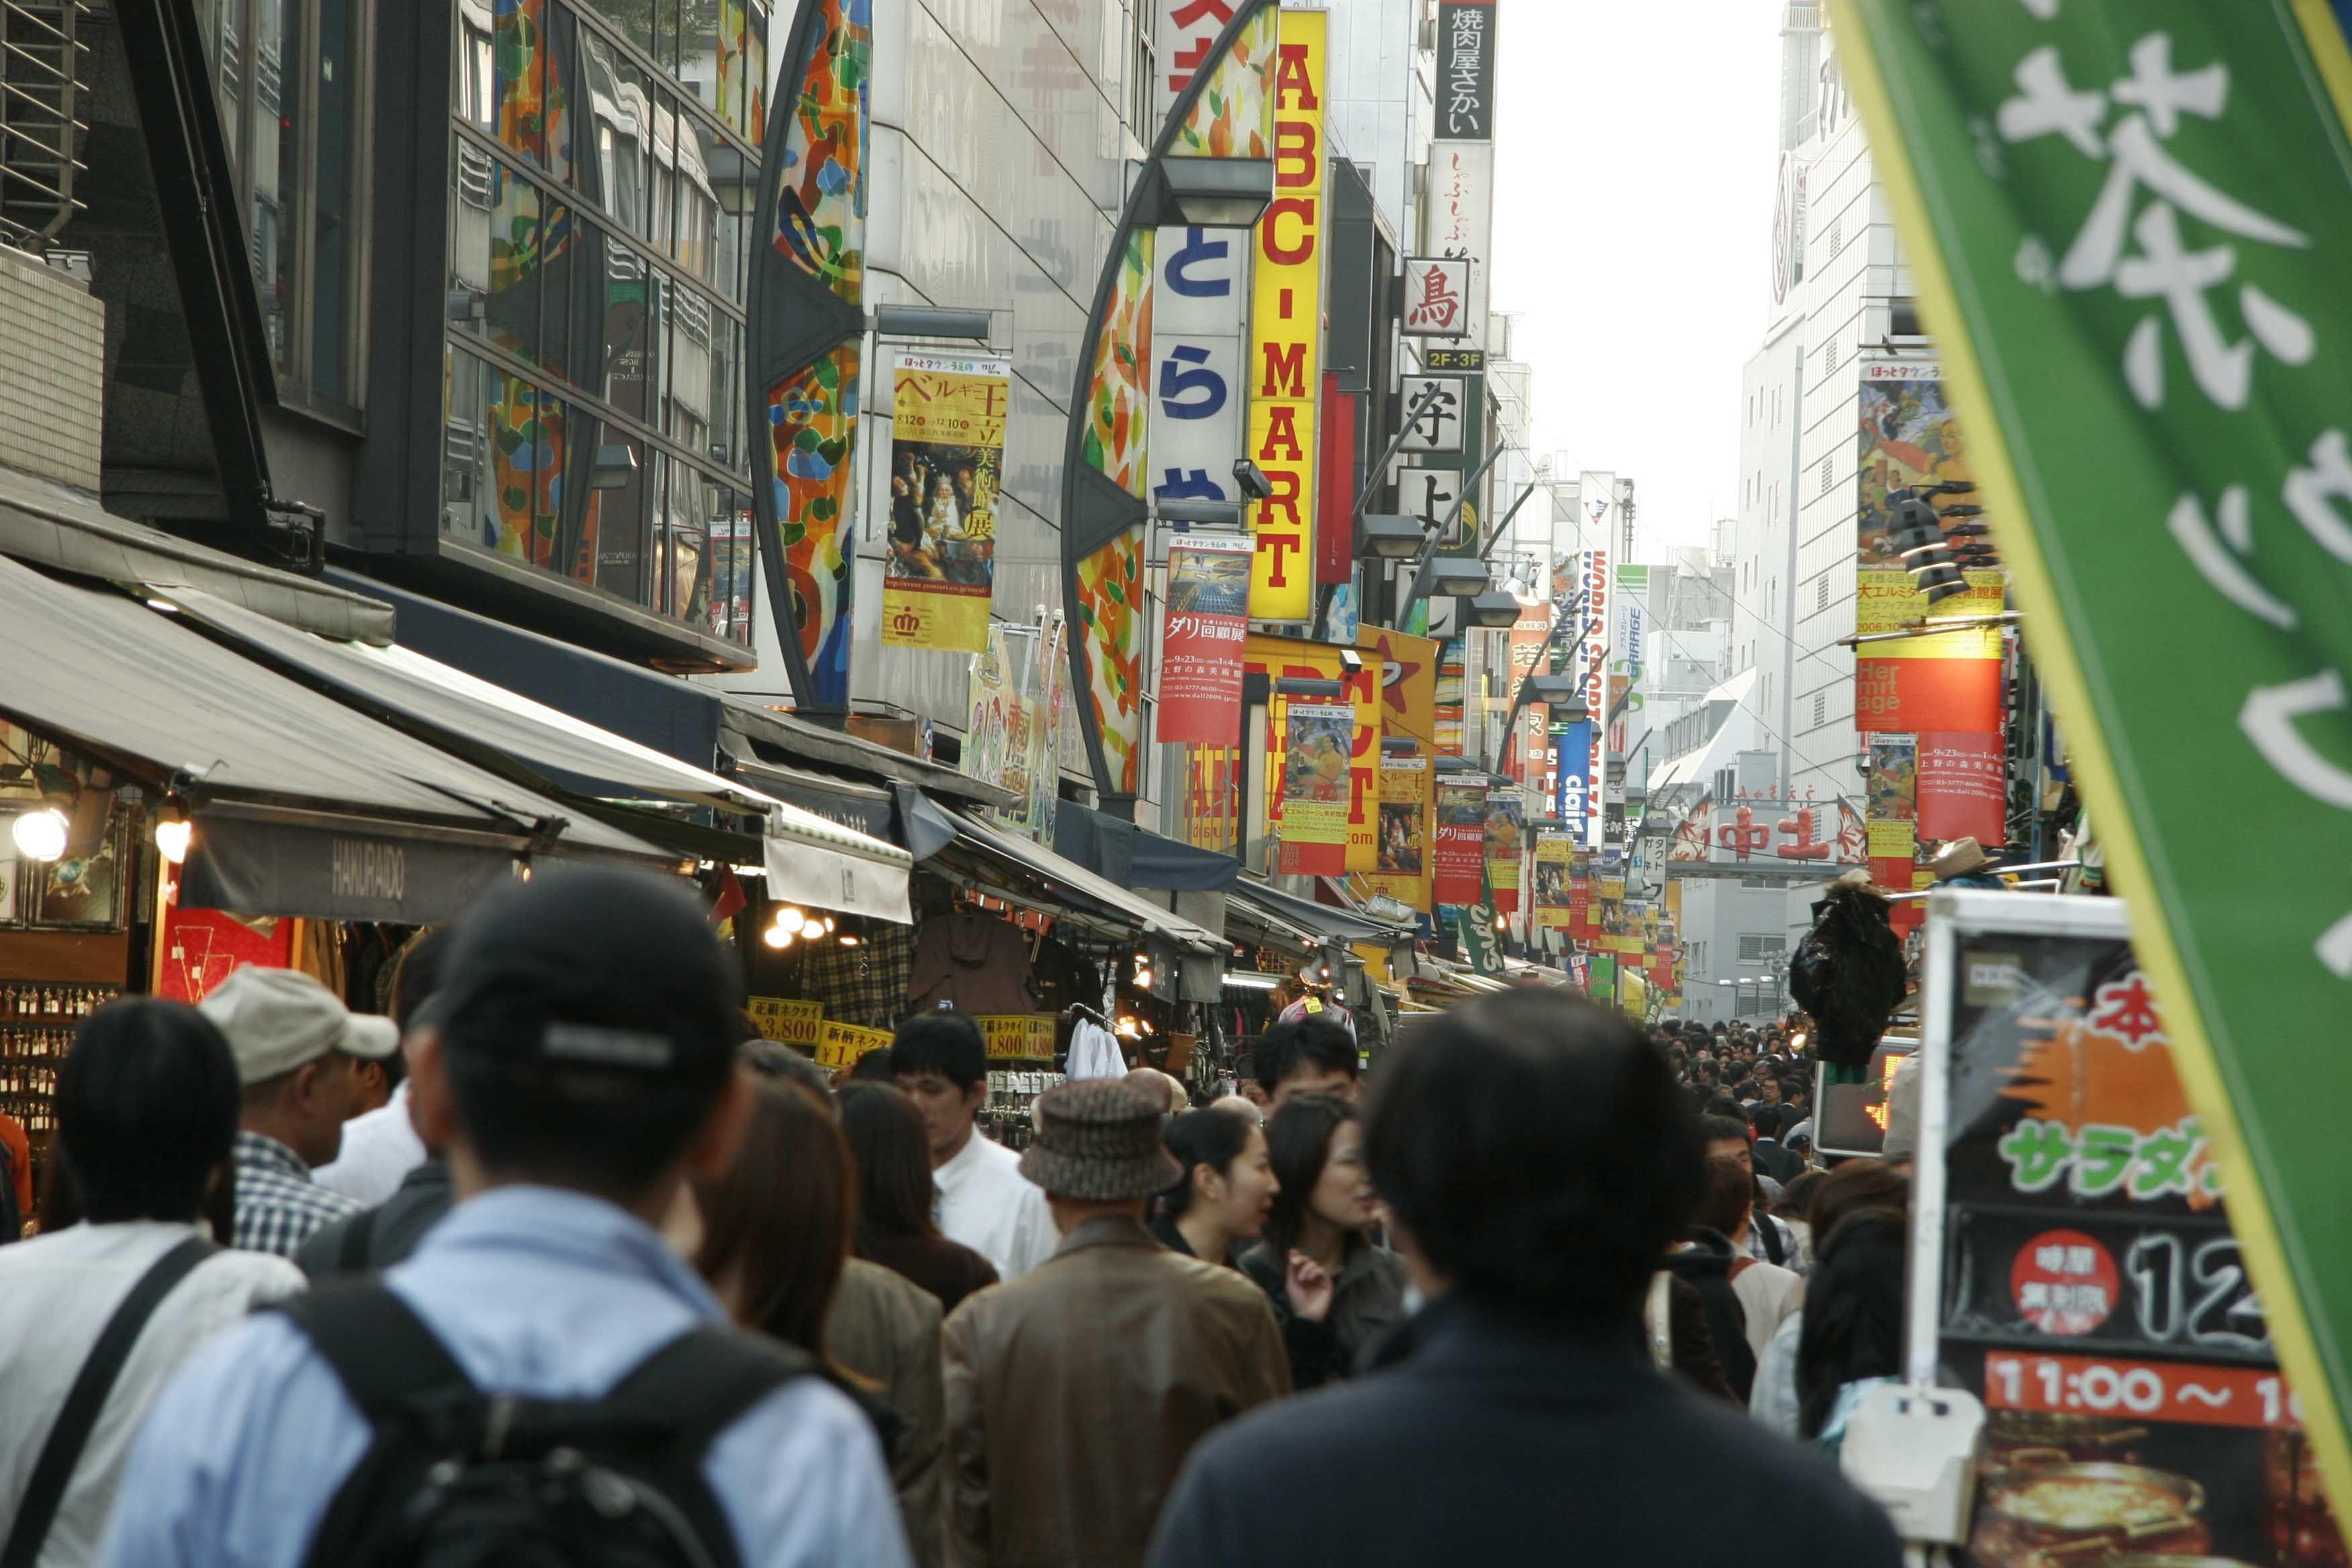 Street life in Tokyo